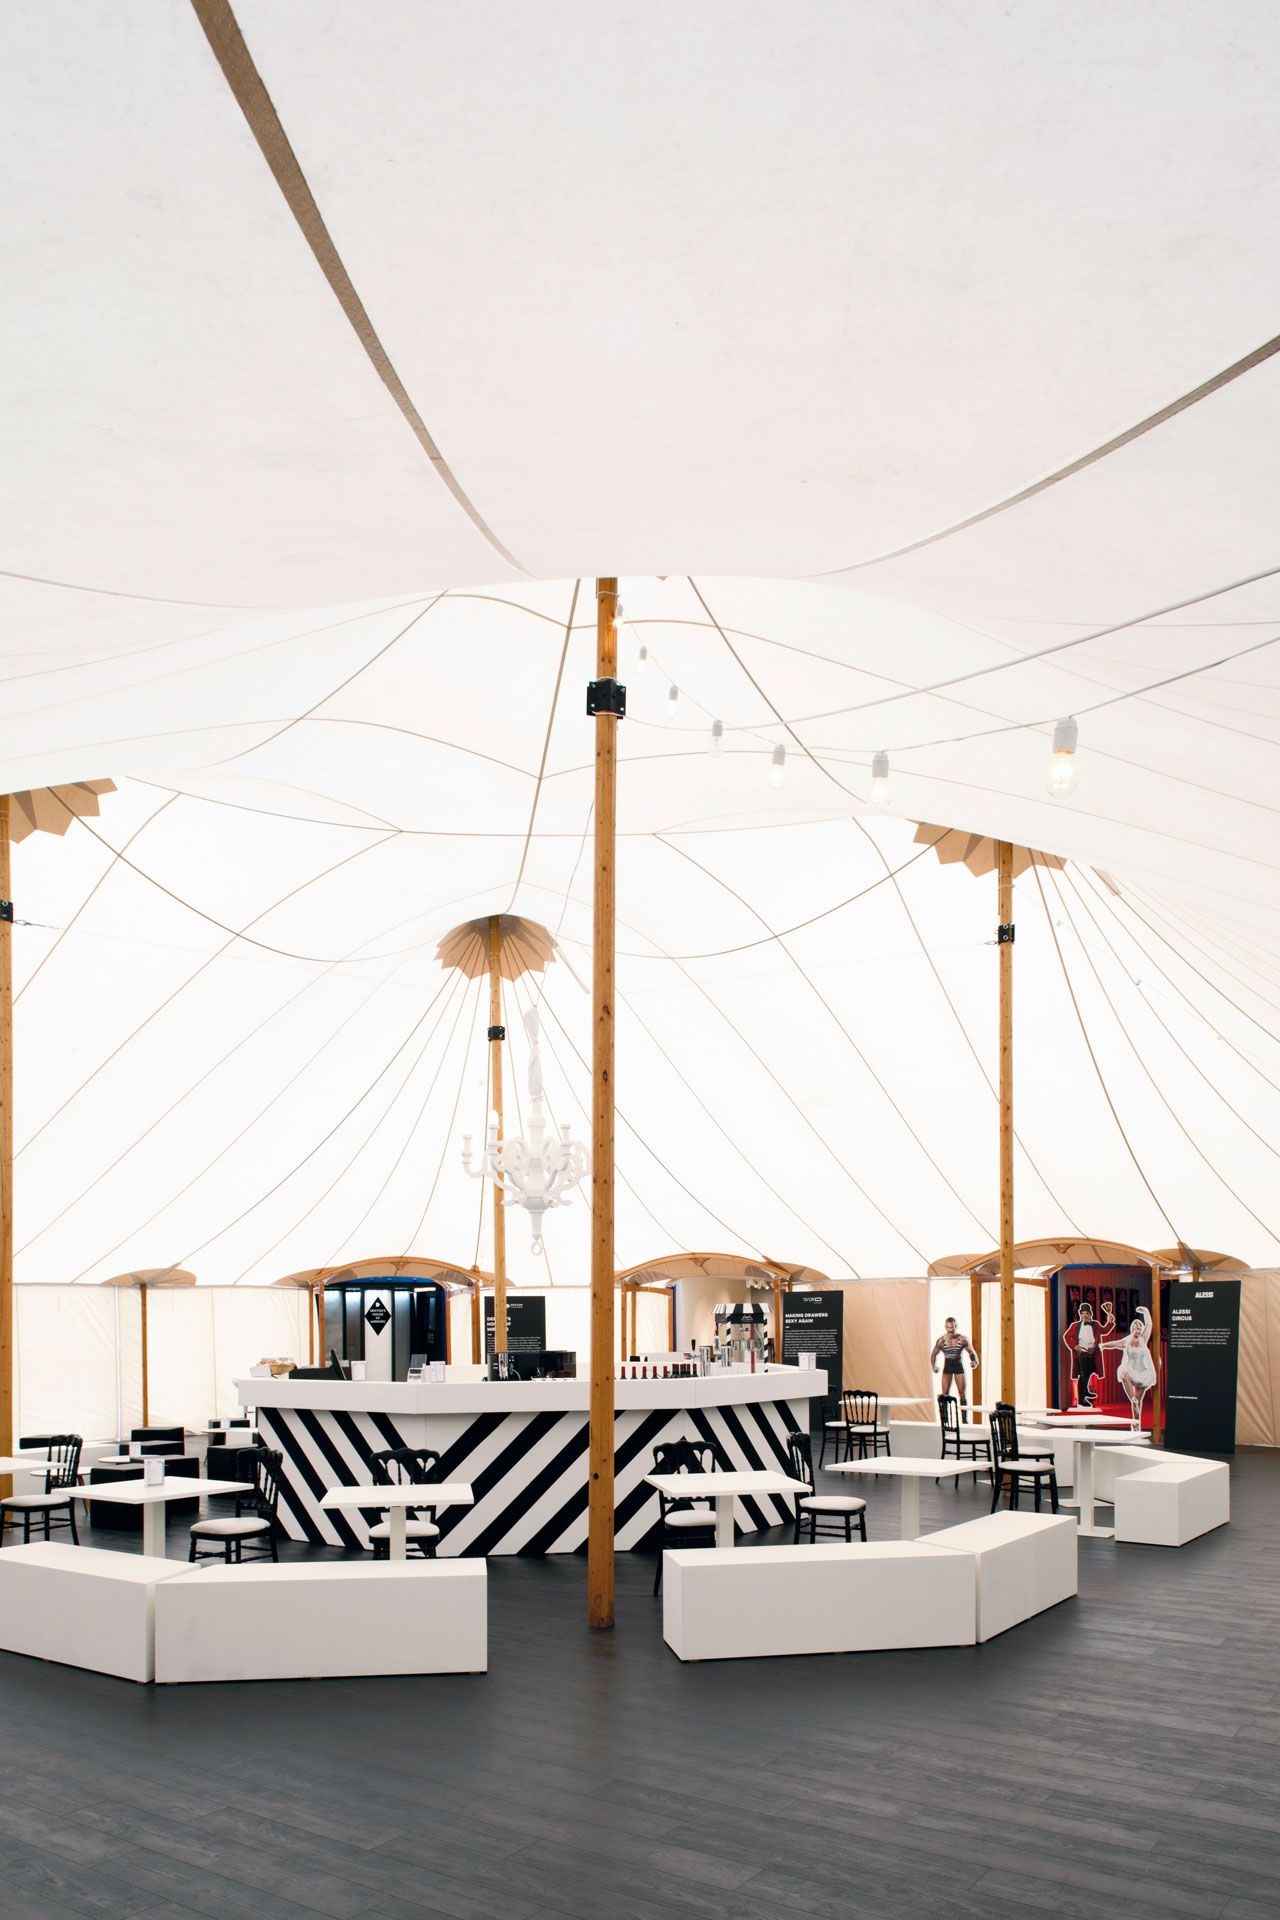 Best Of Biennale Interieur 2016 Kortrijk Yatzer Tent Design Pop Up Tent Pop Up Bar